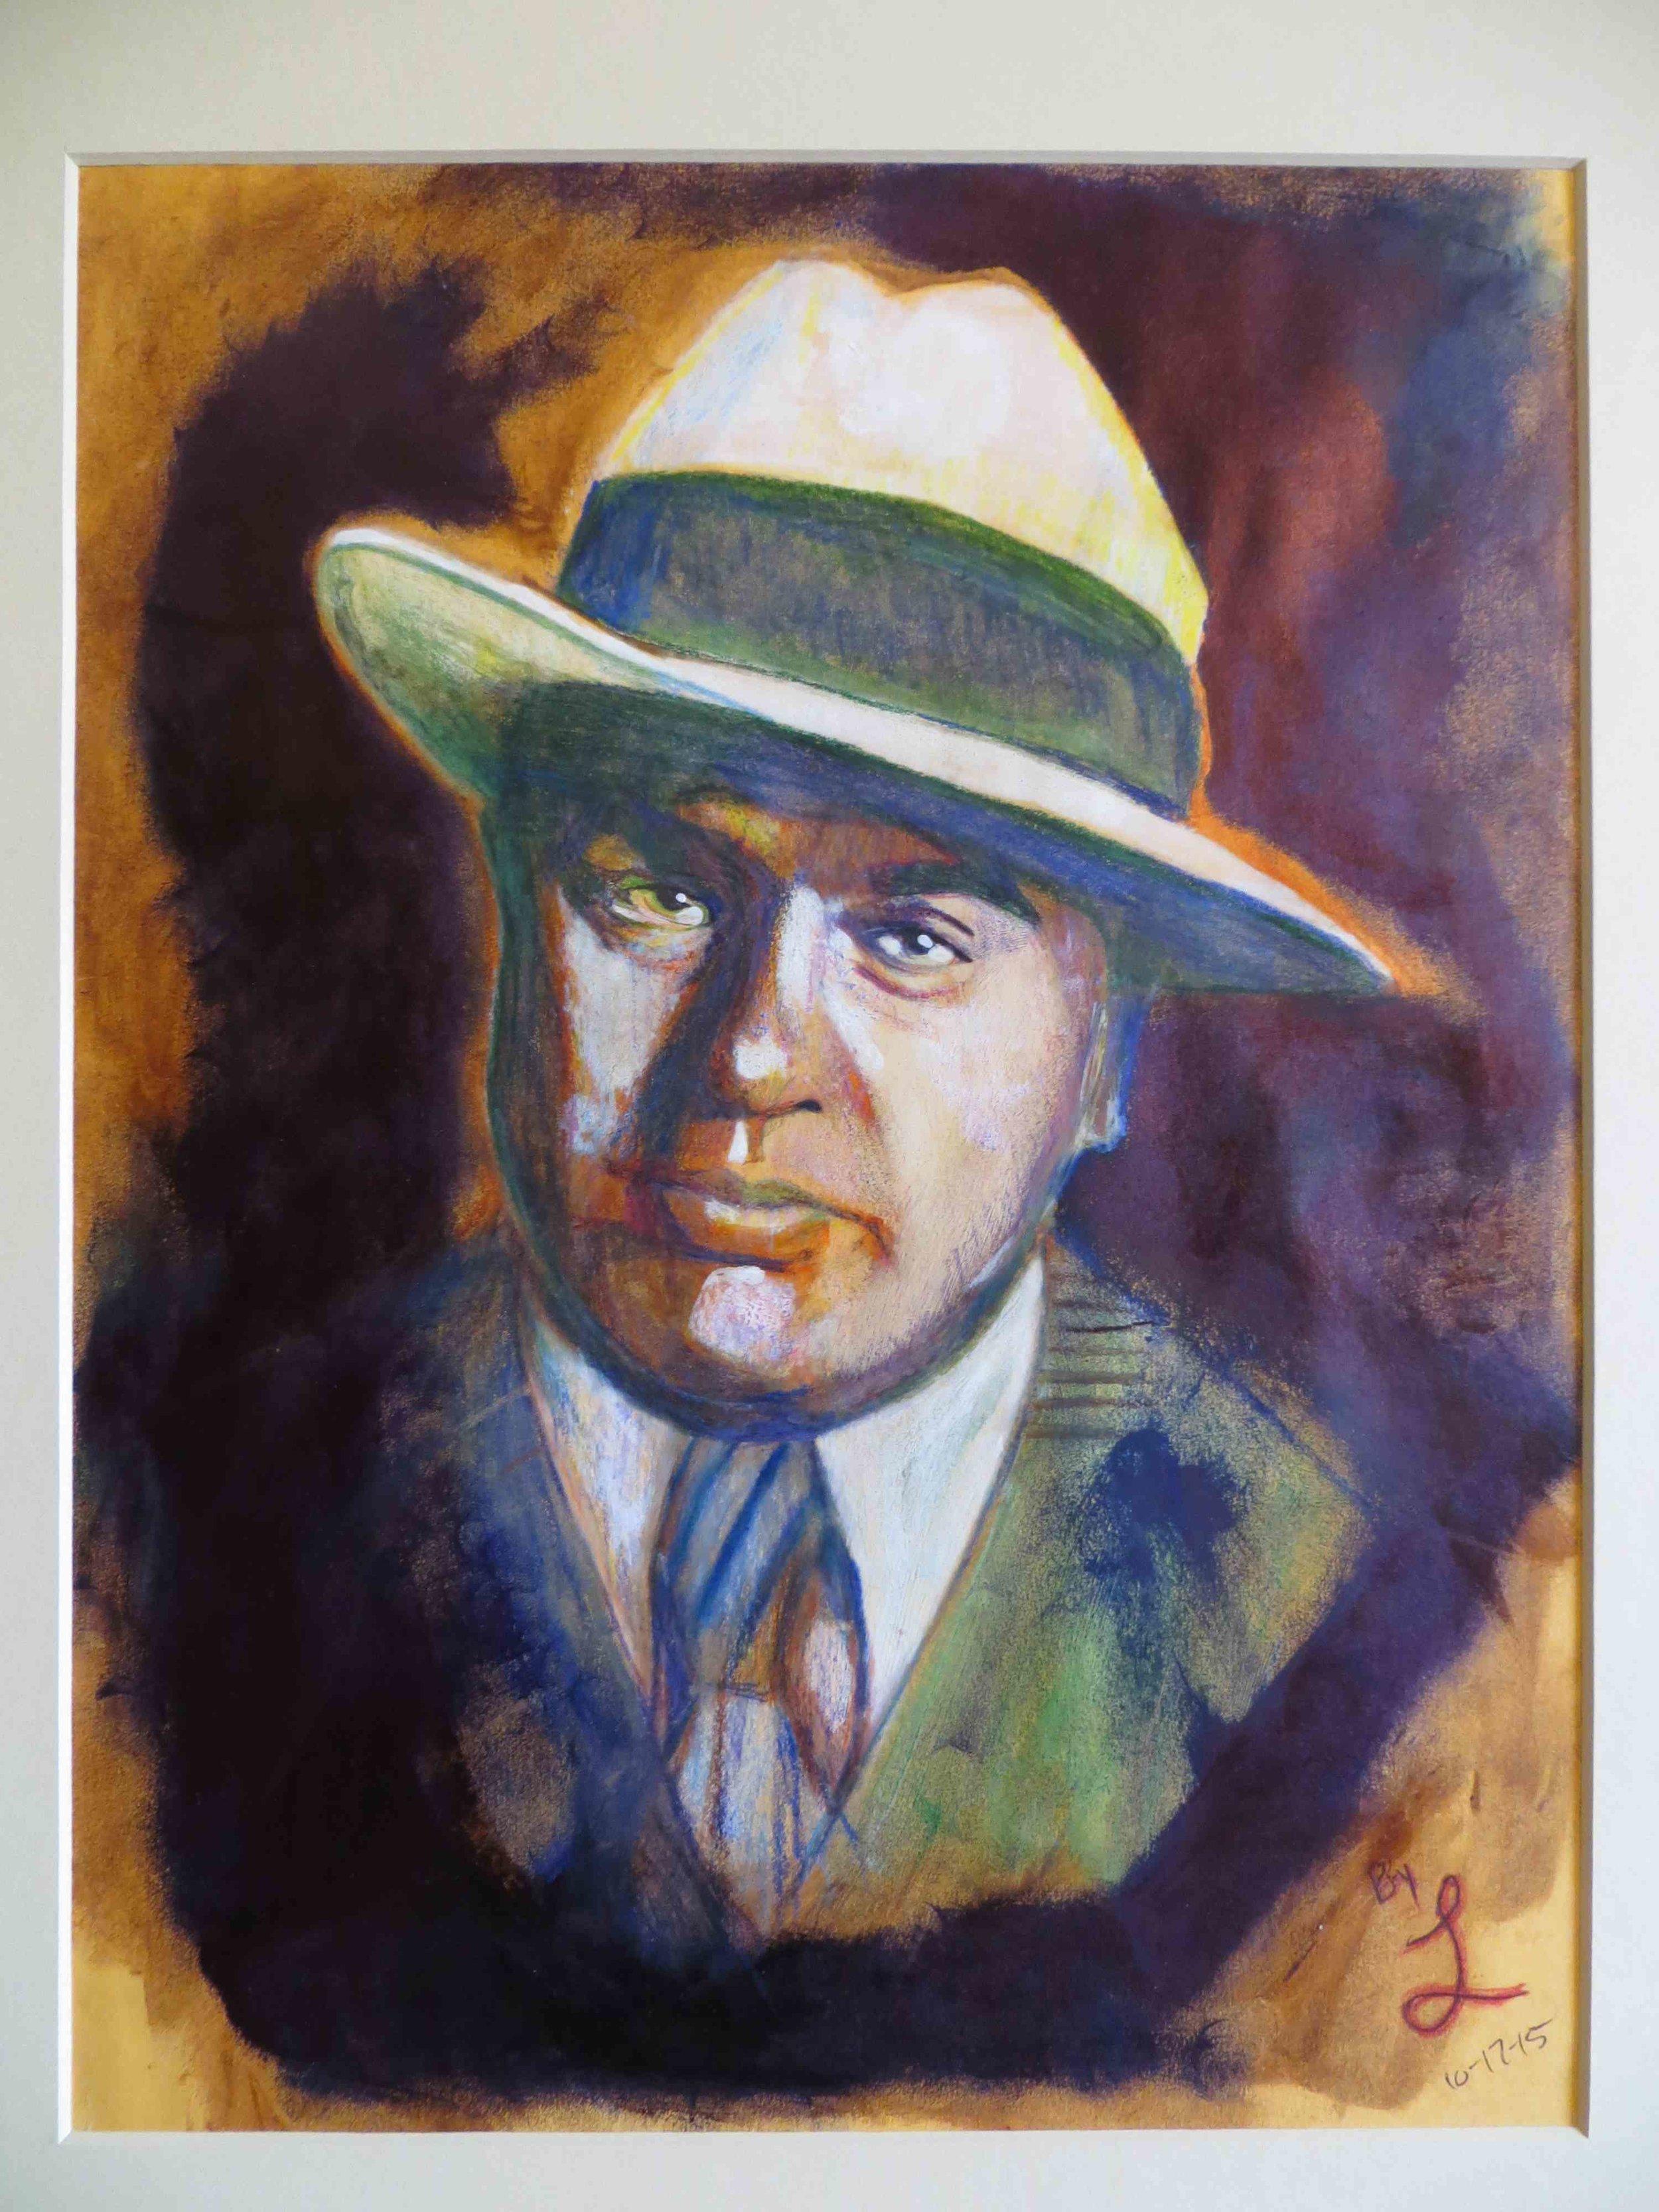 Al Capone by Ely Legerdemain-001 - Copy.jpg